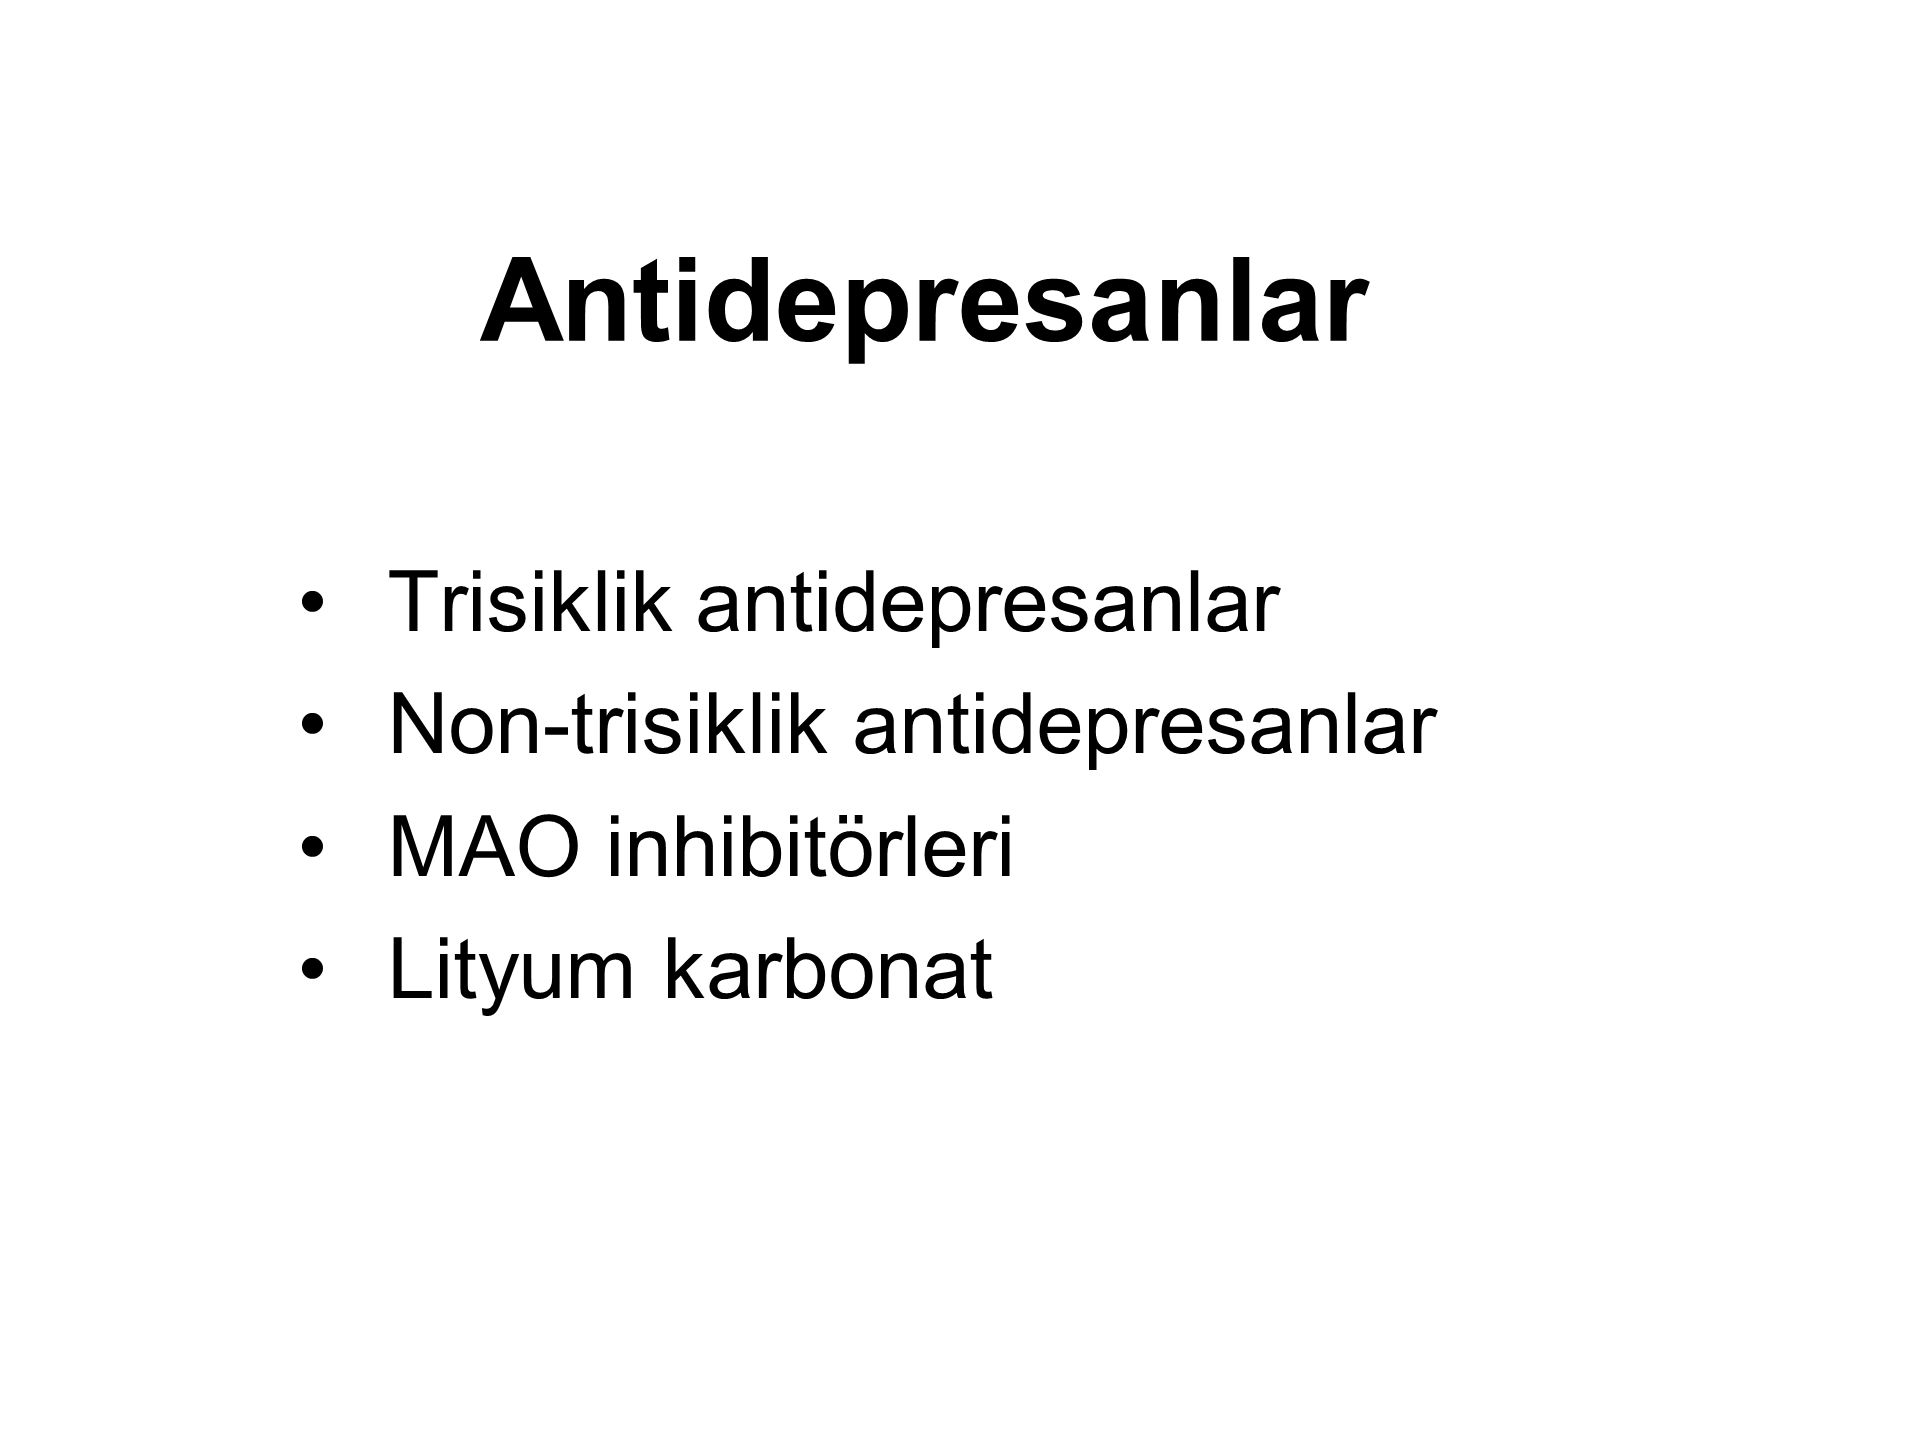 Antidepresanlar Trisiklik antidepresanlar